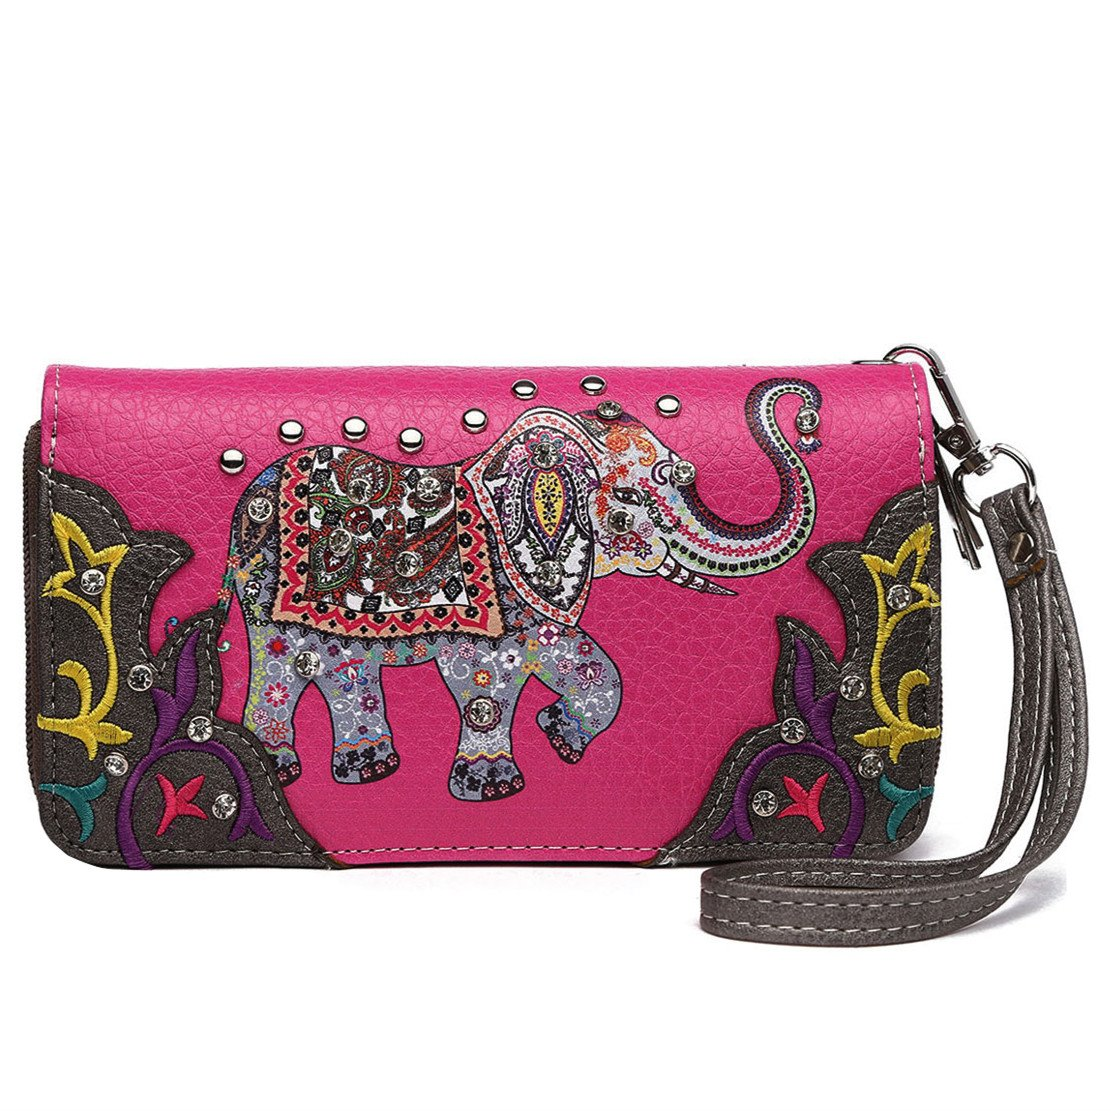 Elephant Floral Spring Rhinestone Studded Western Style Country Purse Wrist Strap Women Wristlets Wallet (Fuchsia) by Cowgirl Trendy